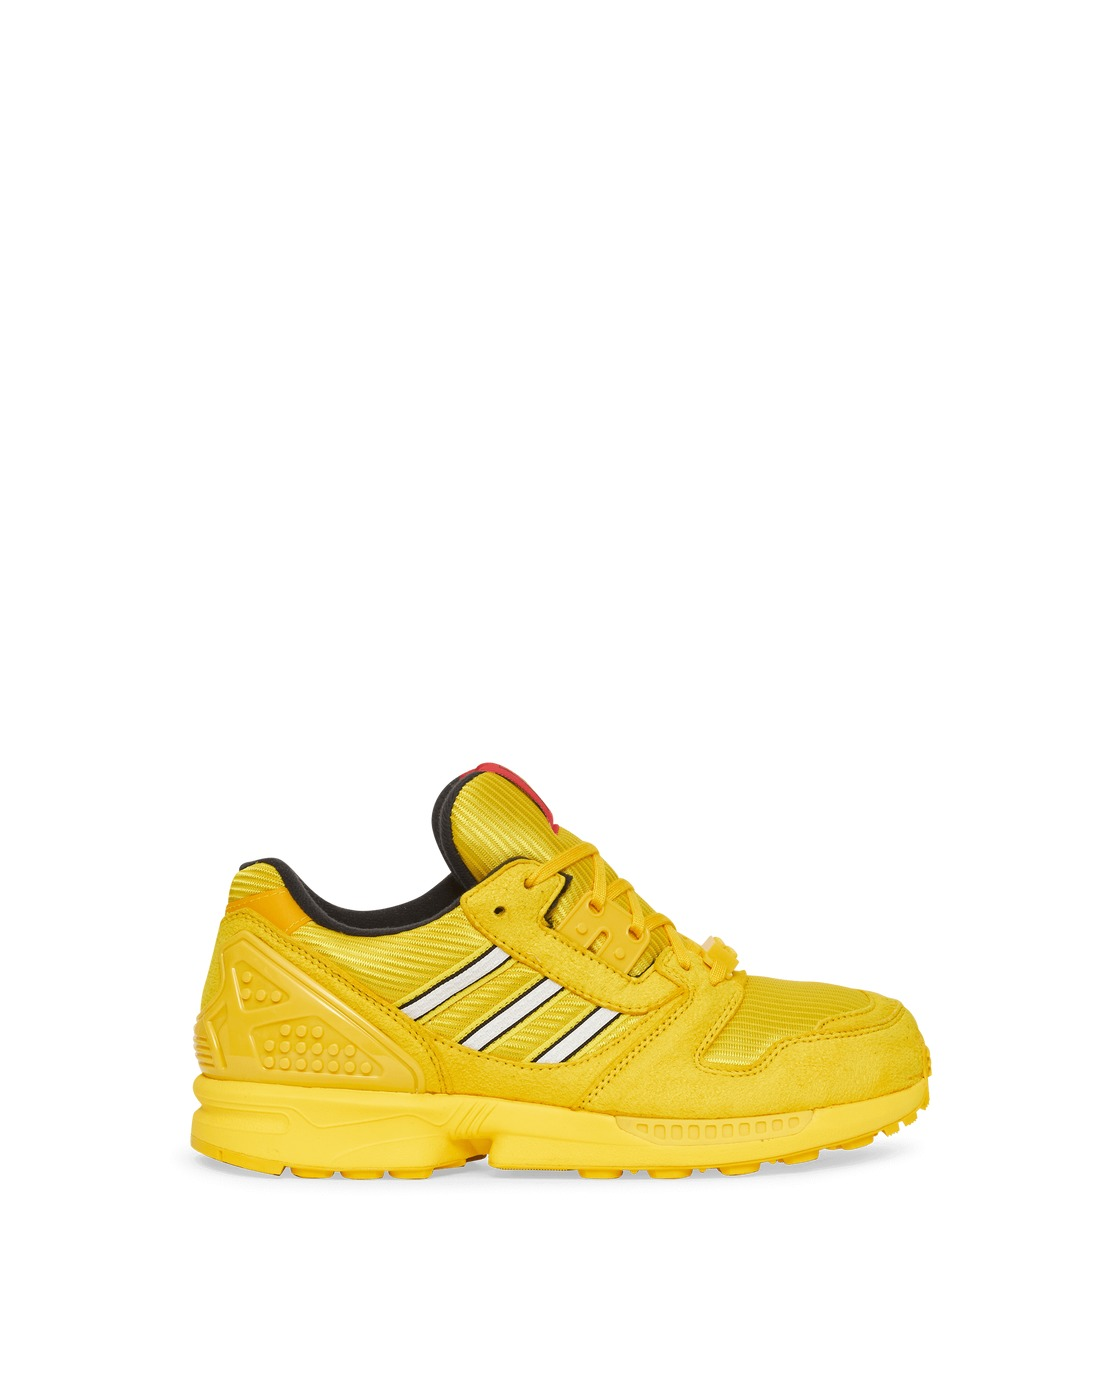 Photo: Adidas Originals Lego Zx 8000 Junior Sneakers Eqt Yellow/Ftwr White